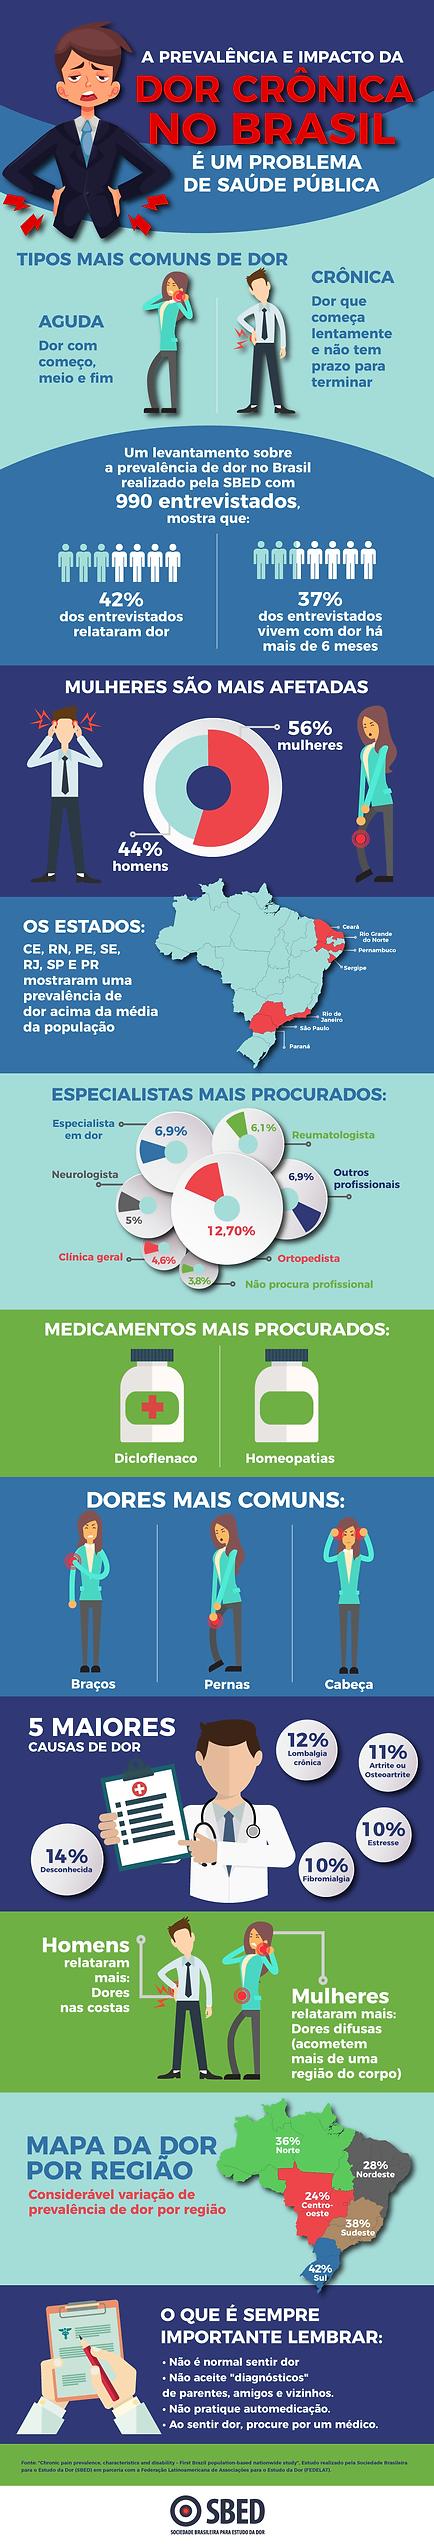 dor cronica no brasil sbed